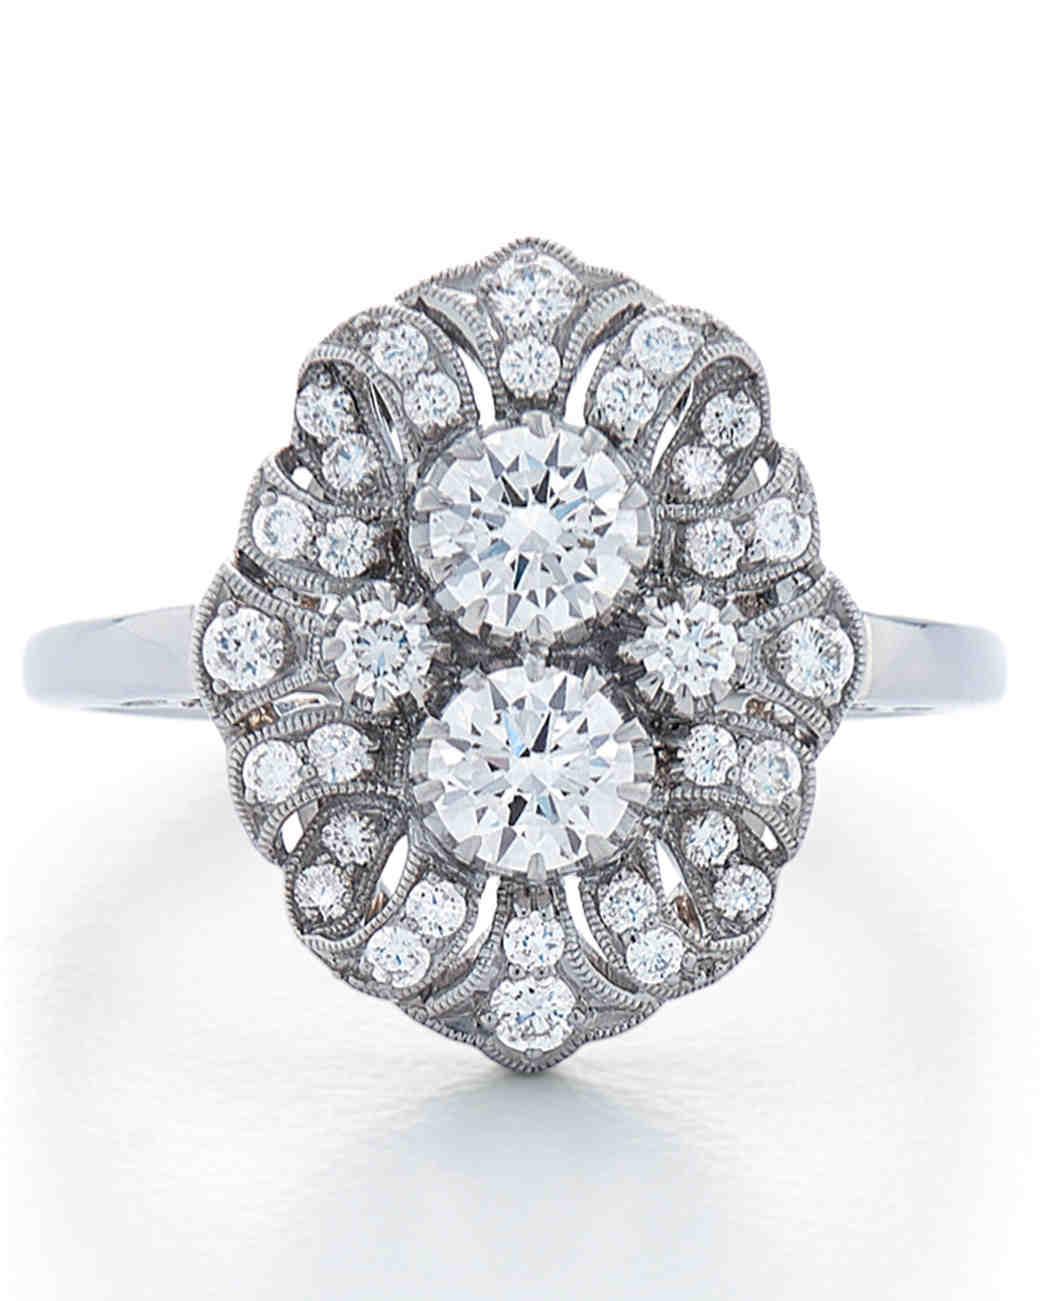 Kwiat vintage art deco double-stone engagement ring